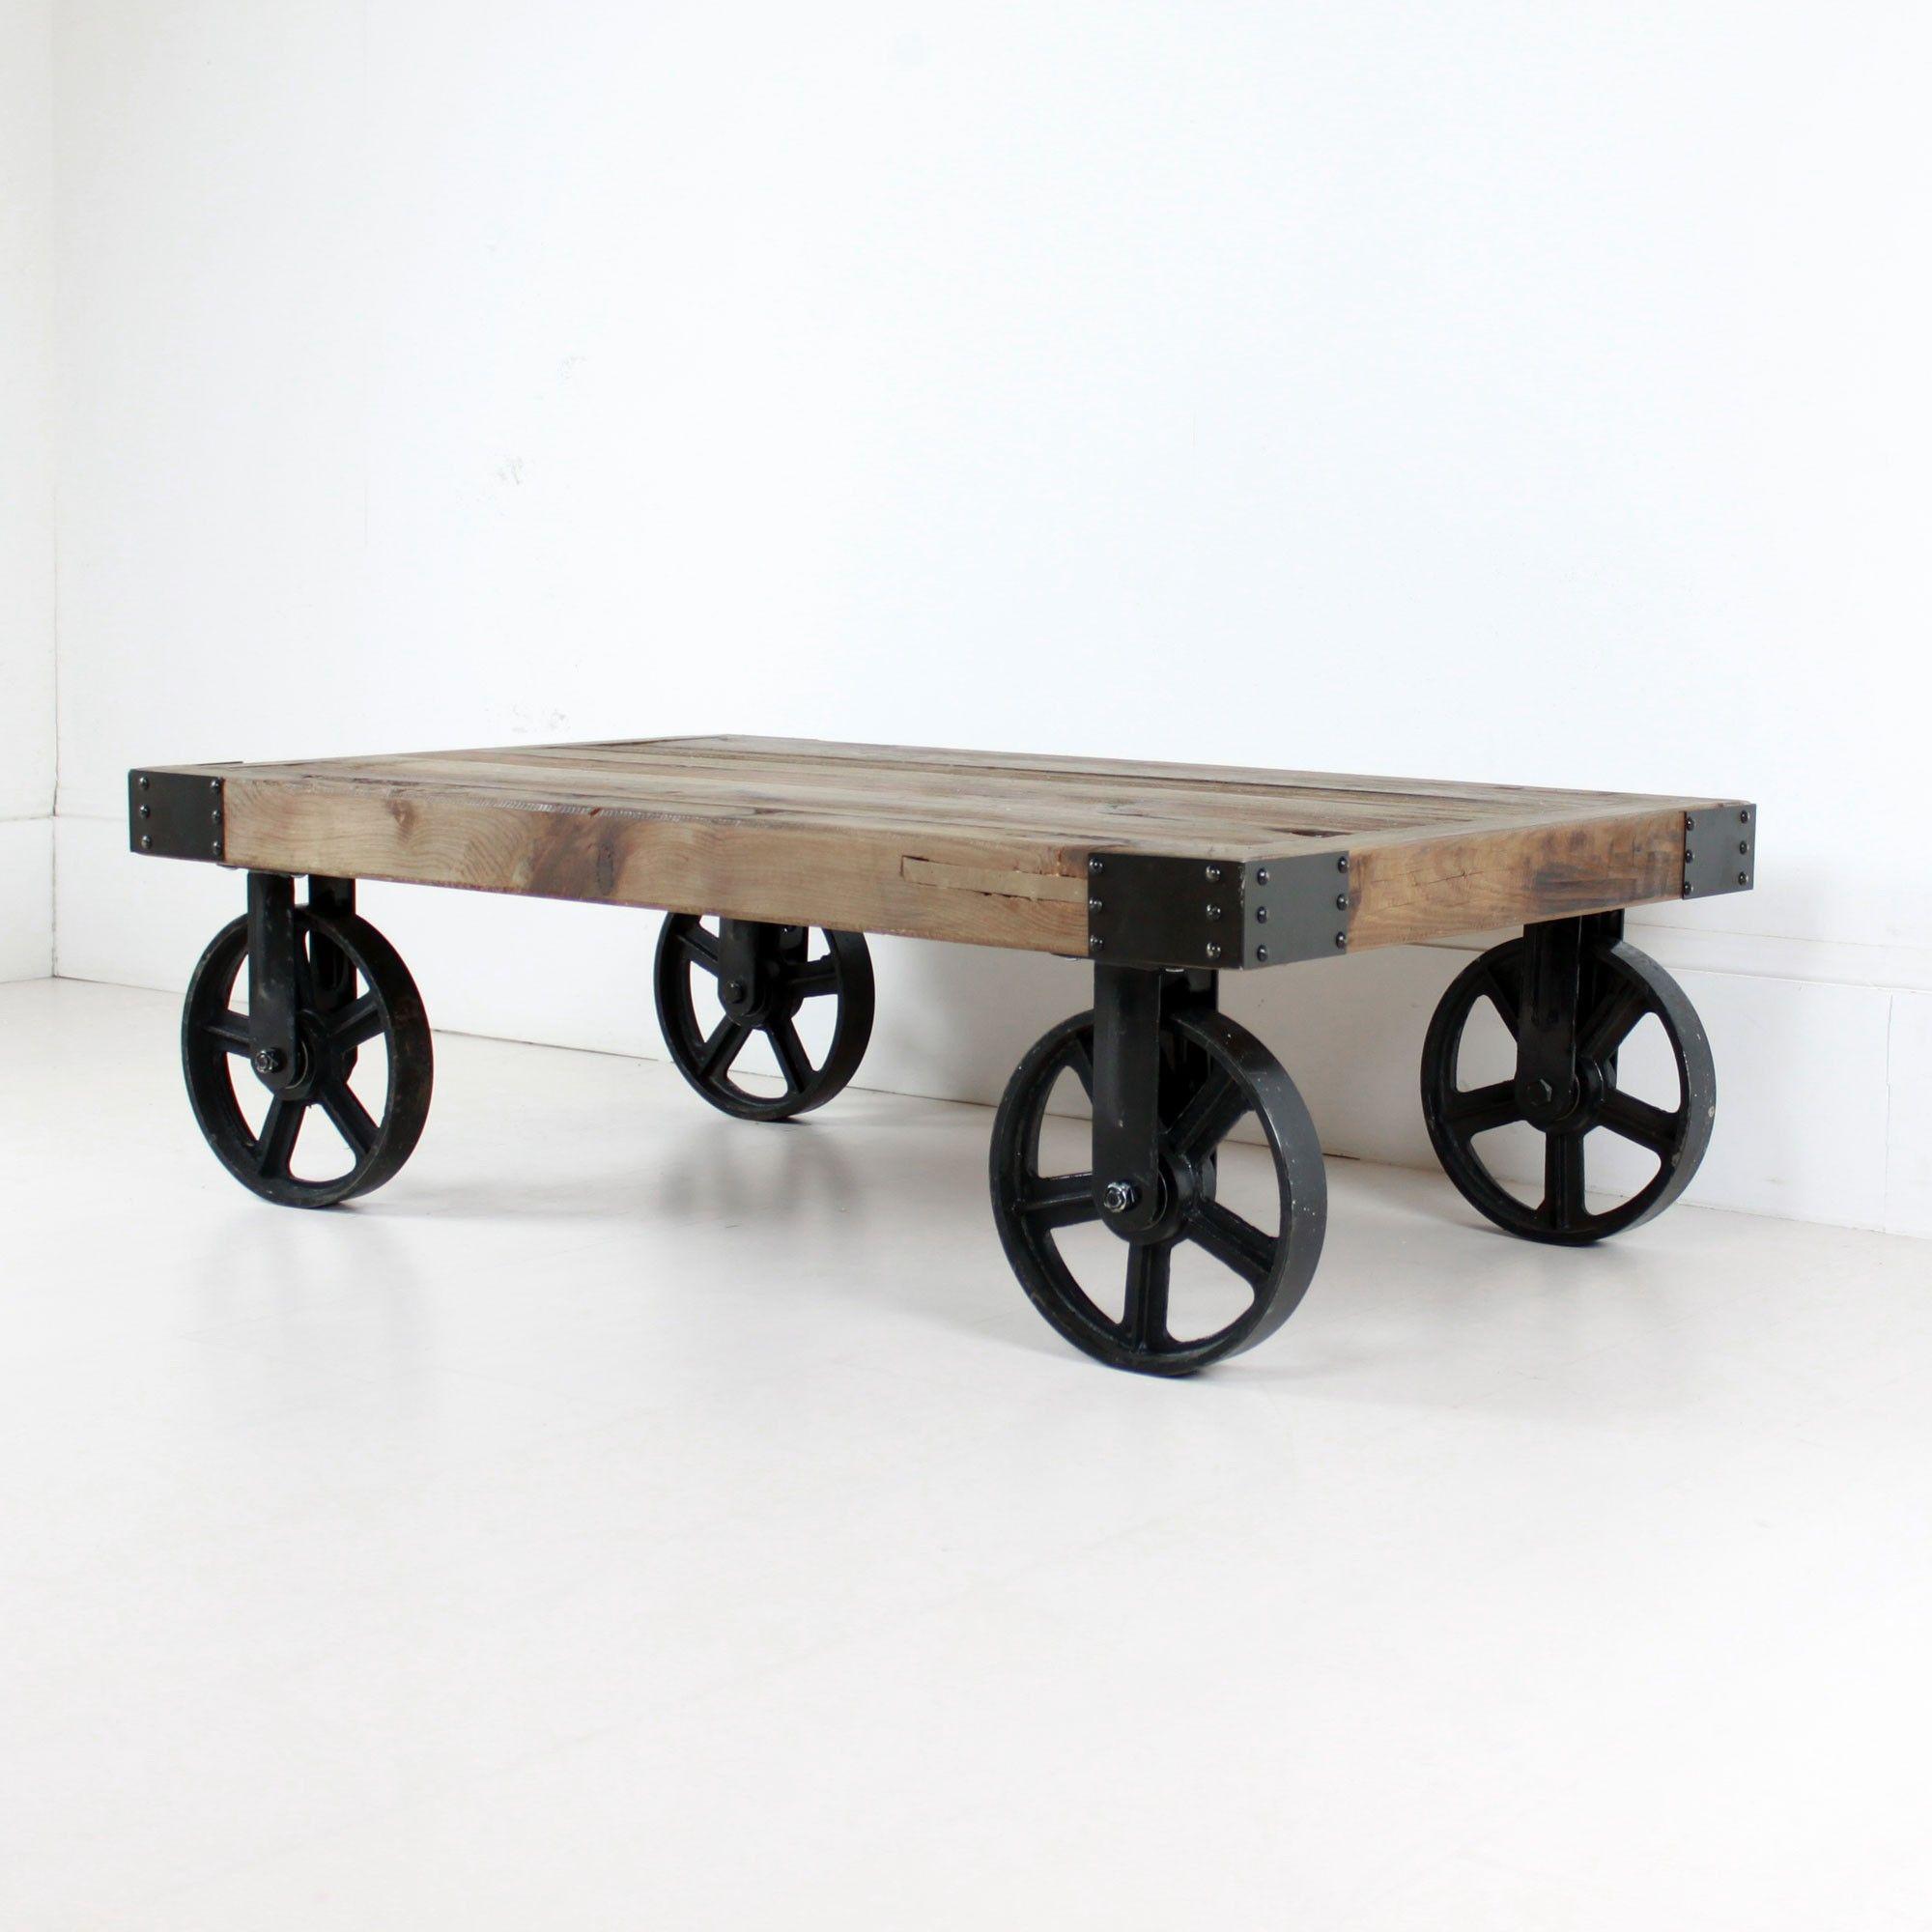 industrial furniture wheels. Industrial Coffee Table On Wheels Furniture E